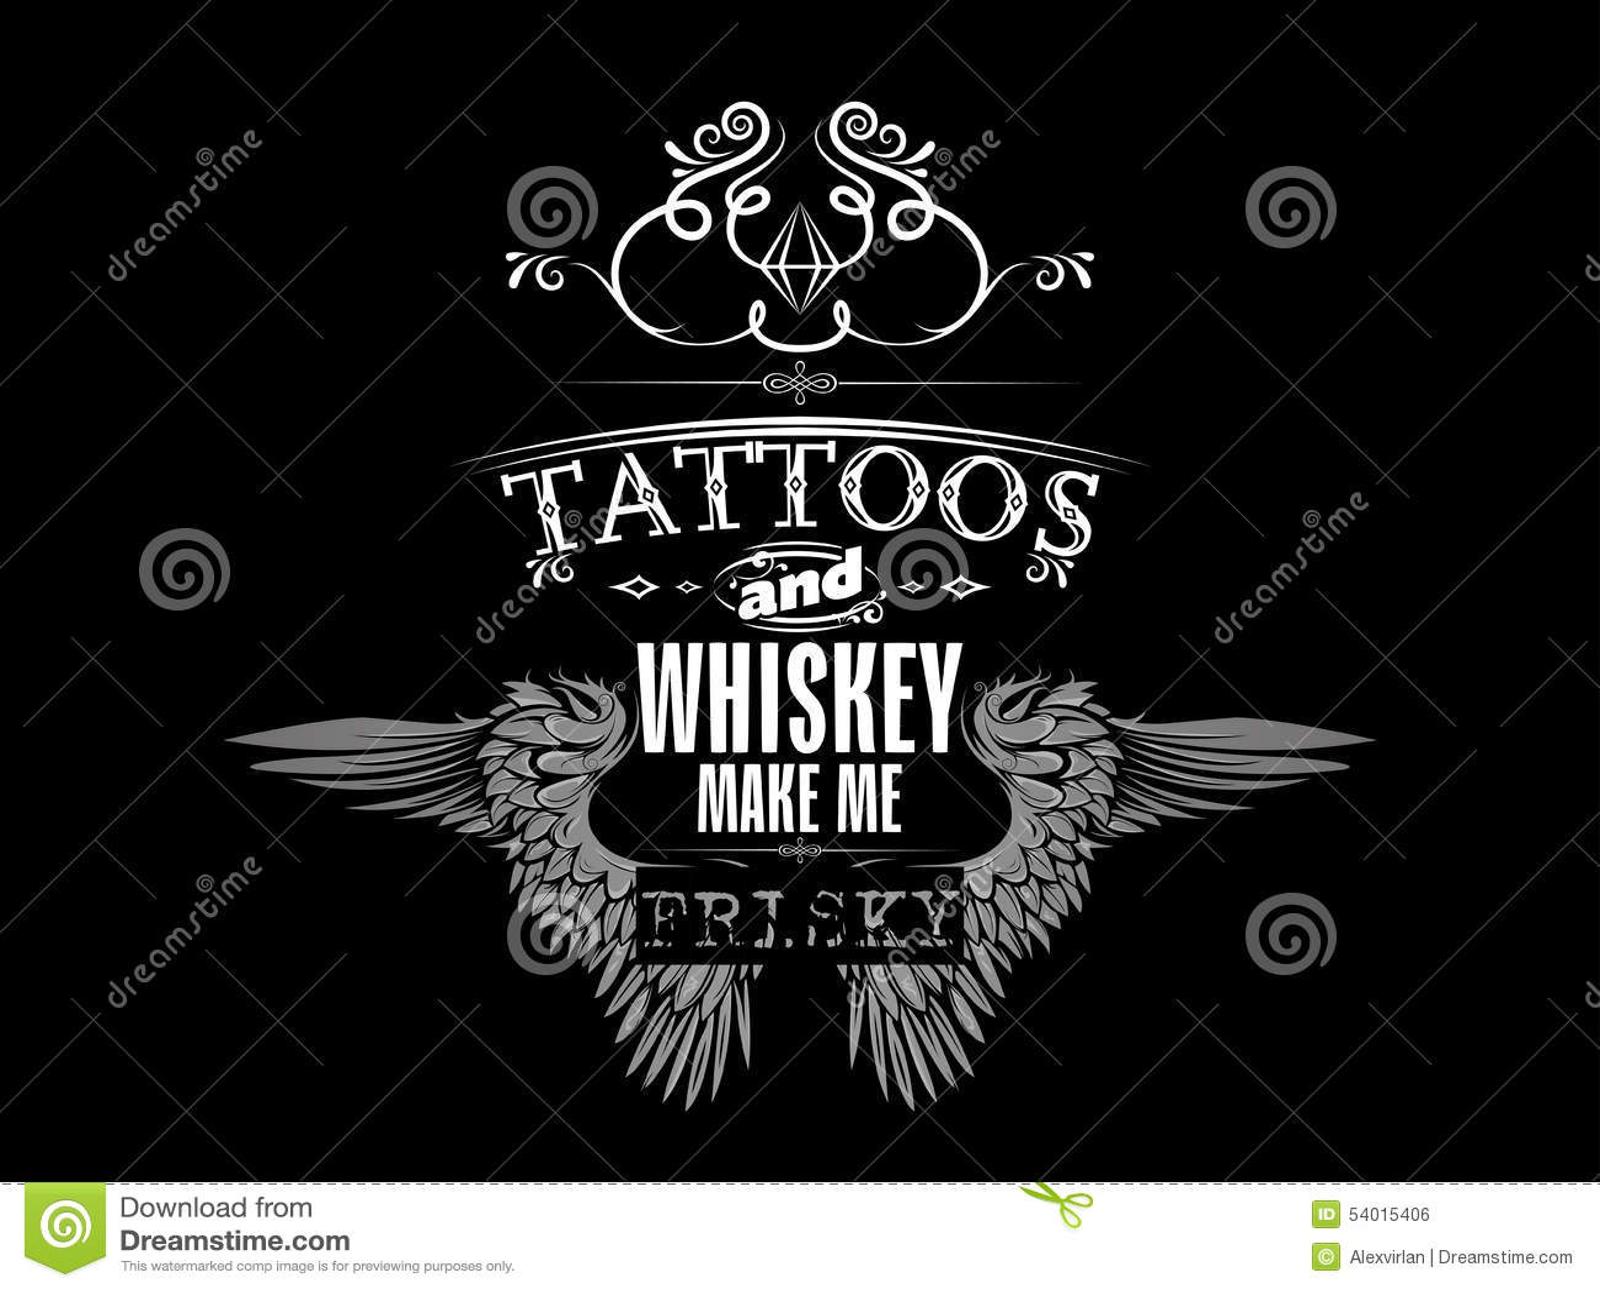 whiskey tshirt design stock vector image 54015406. Black Bedroom Furniture Sets. Home Design Ideas